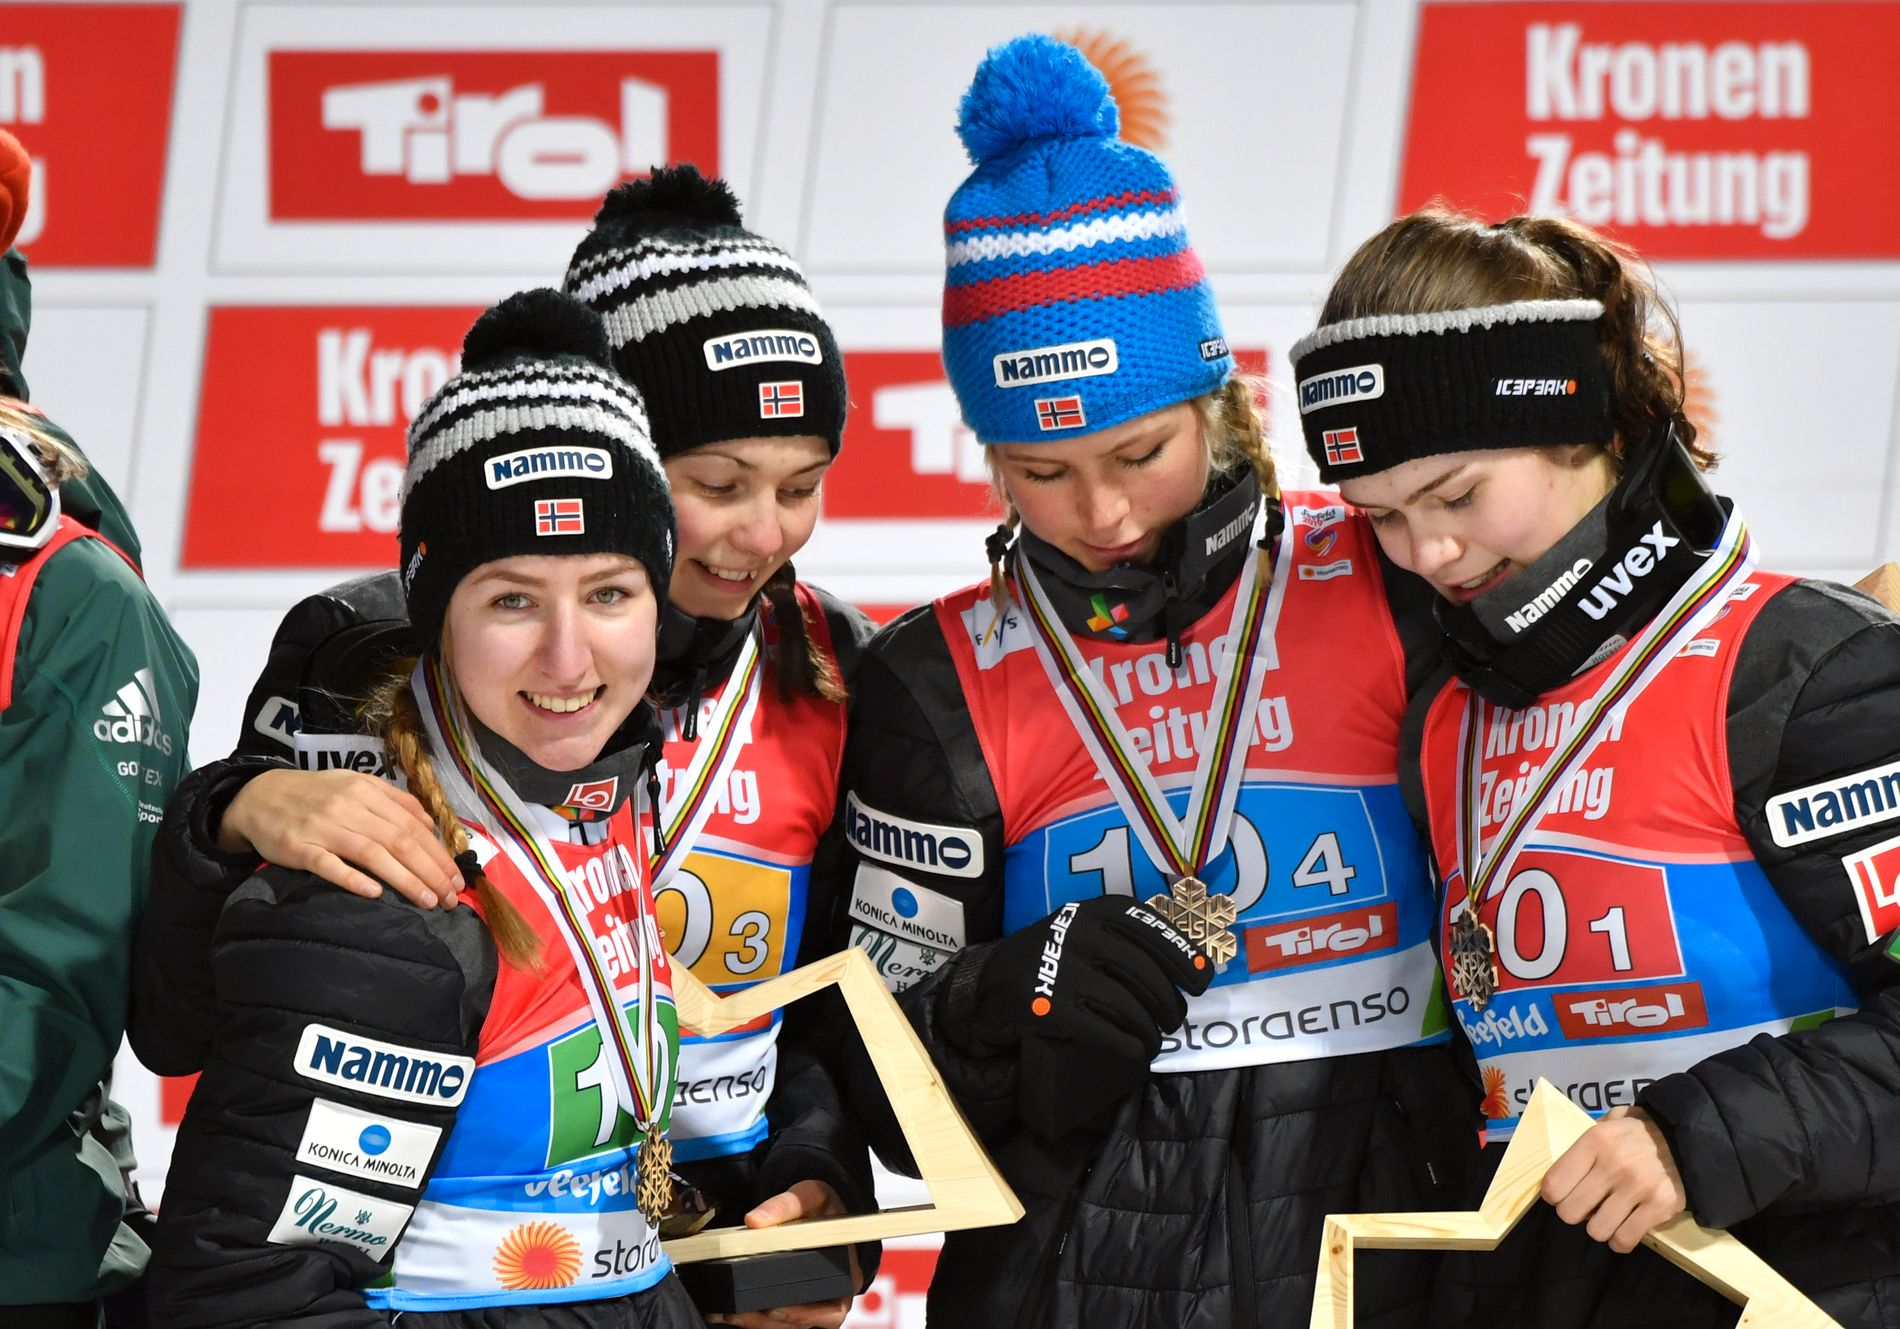 BRONSEJENTENE: Ingebjørg Saglien Bråten, Silje Opseth, Maren Lundby og Anna Odine Strøm studerer VM-bronsen etter laghopp.